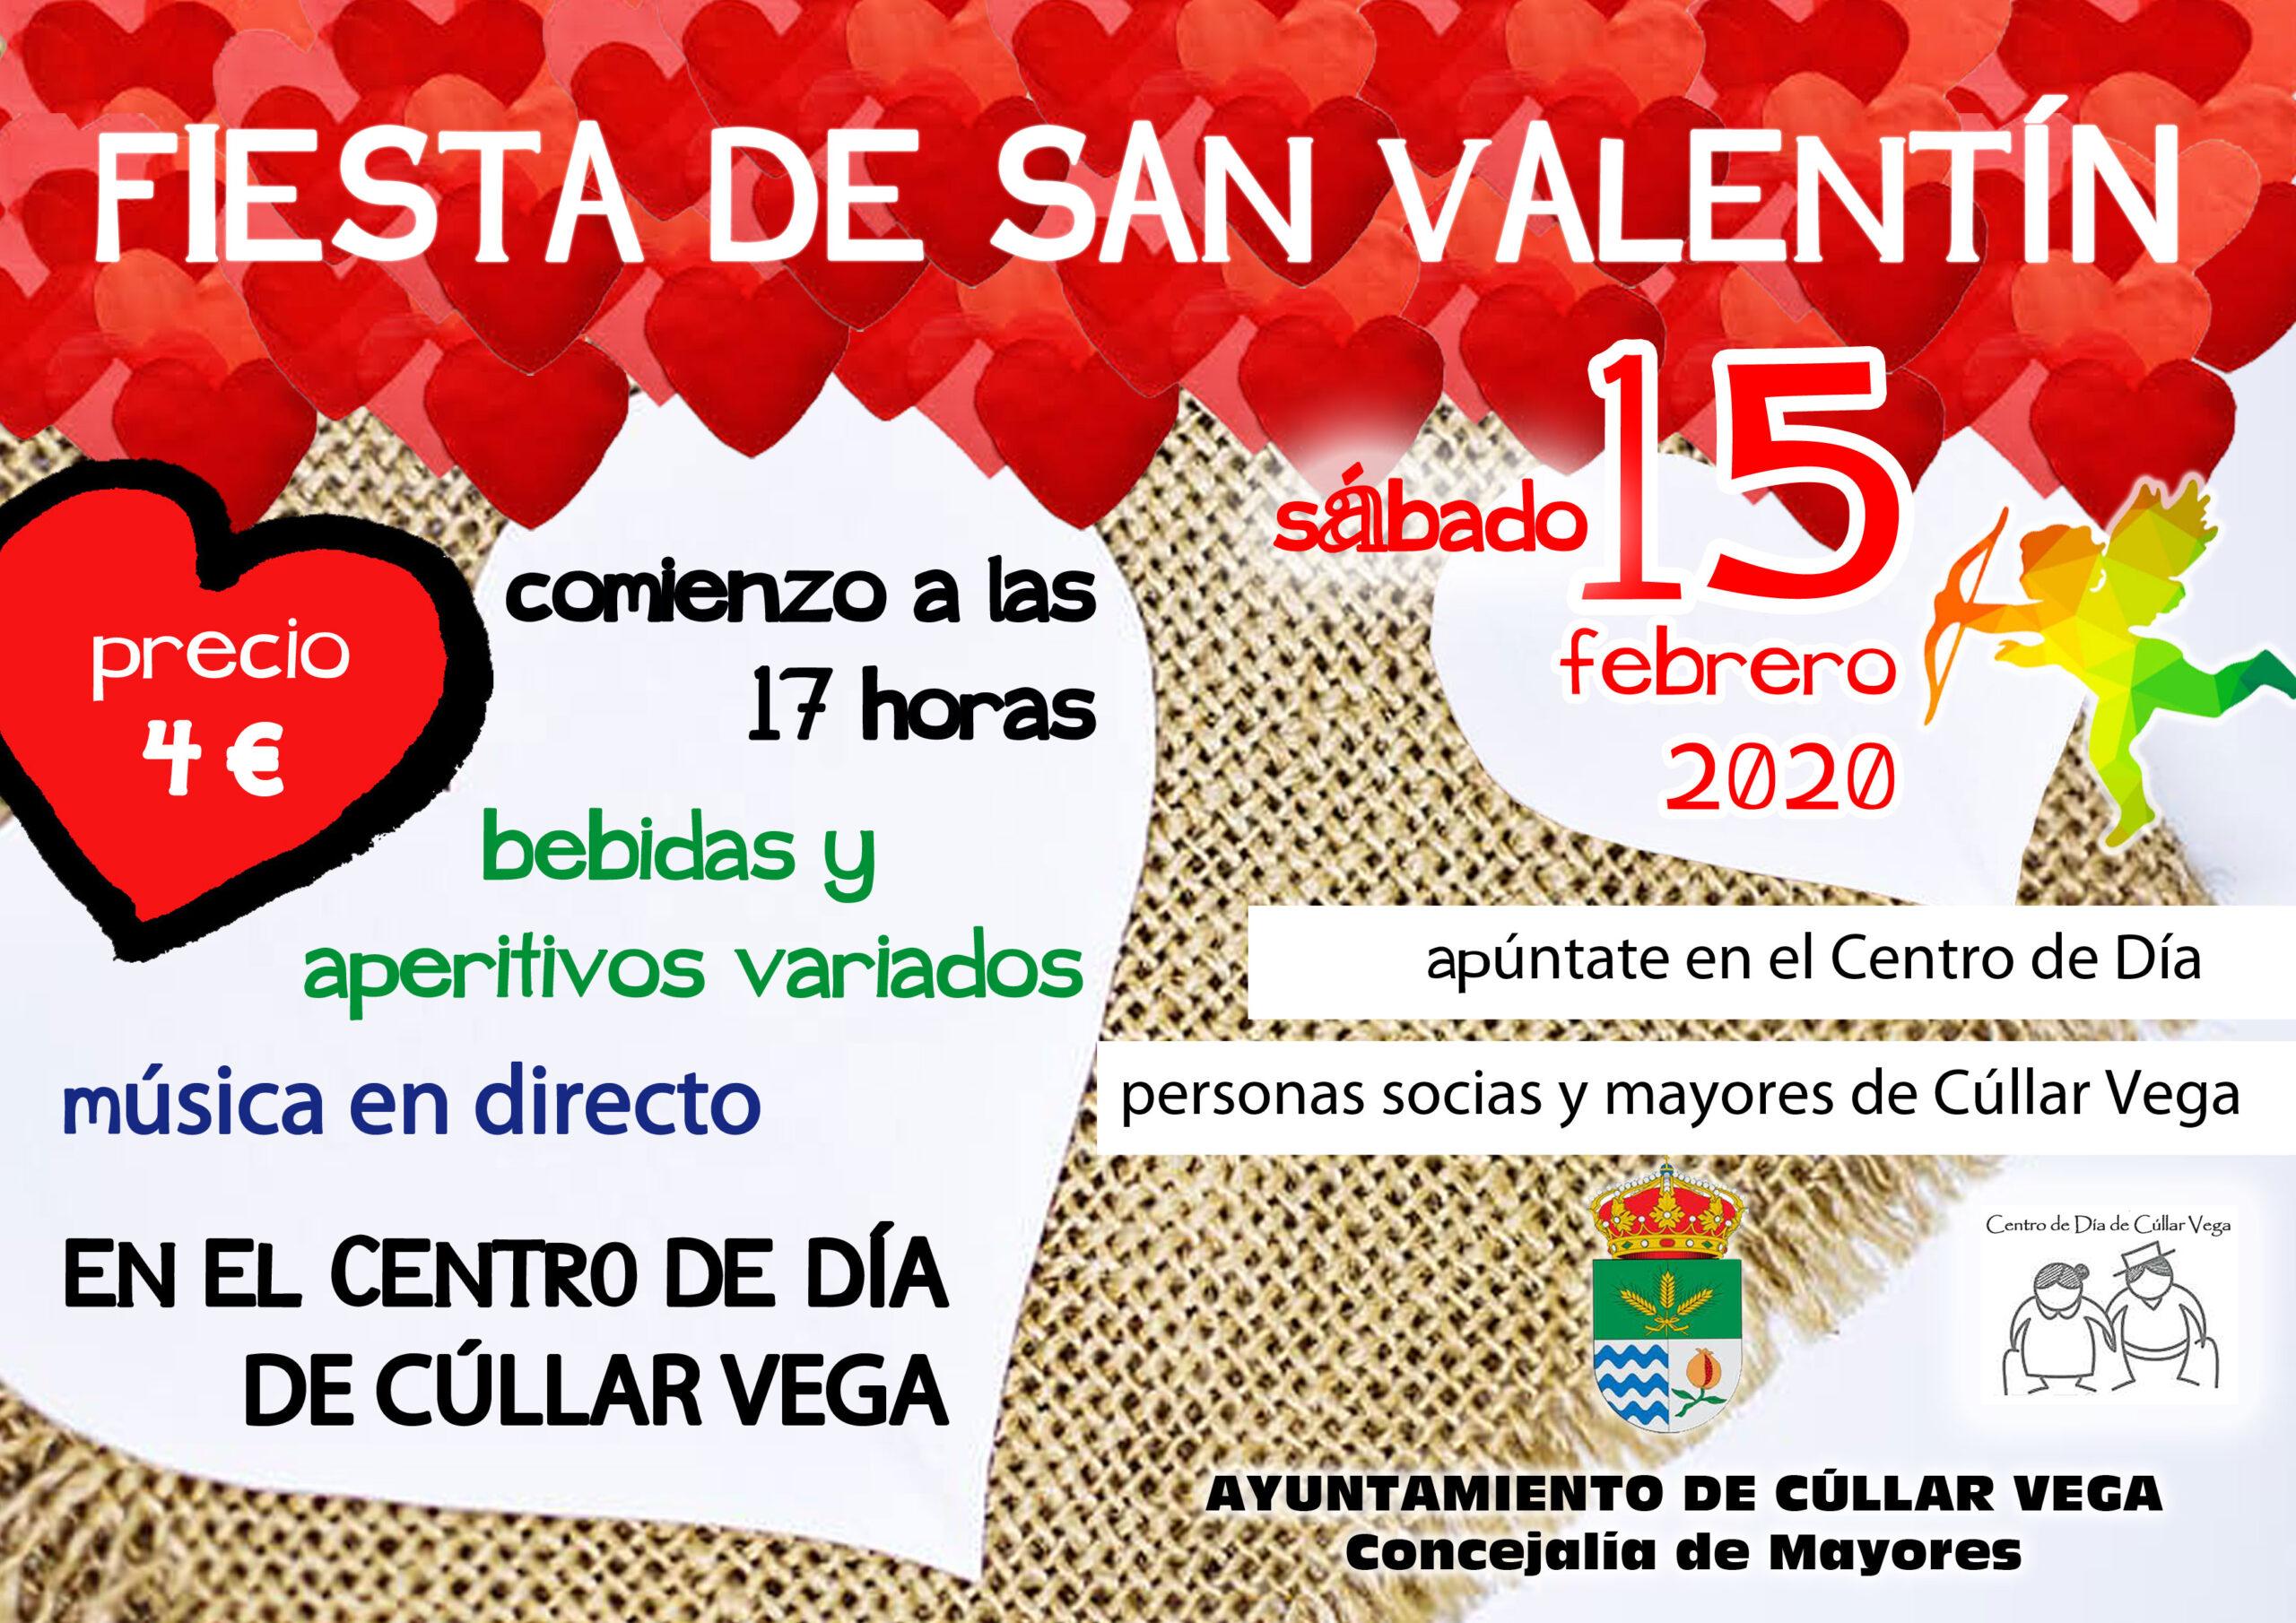 Fiesta de San Valentín 2020